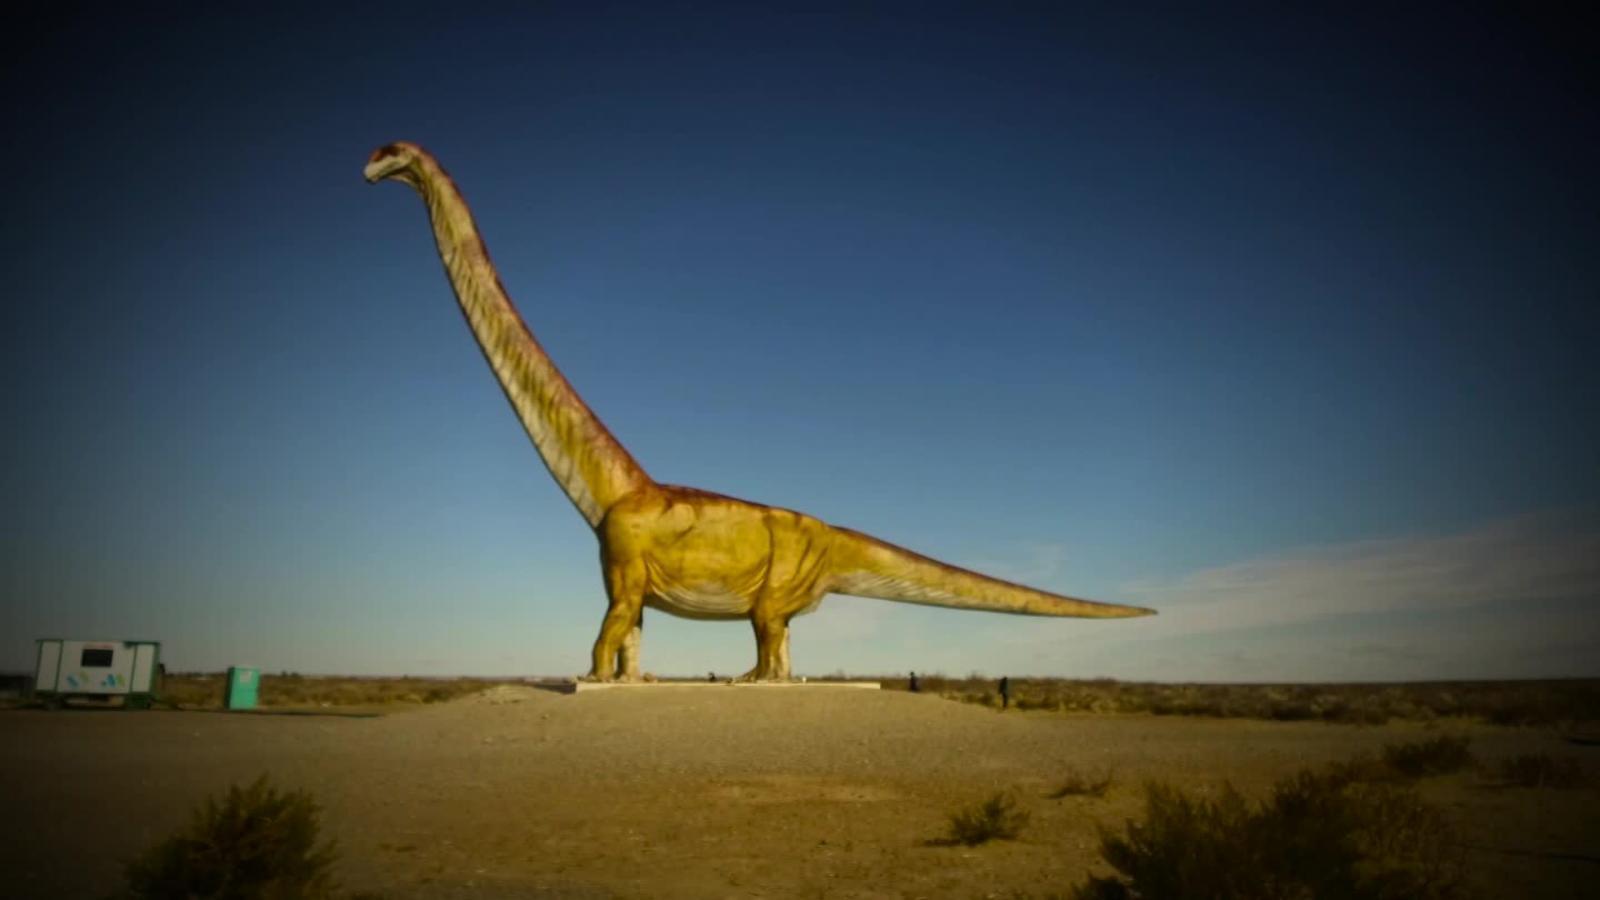 ¿Por qué Argentina tiene tantos fósiles de dinosaurios? https://t.co/txmoTMp13z https://t.co/65NSIP3VBw